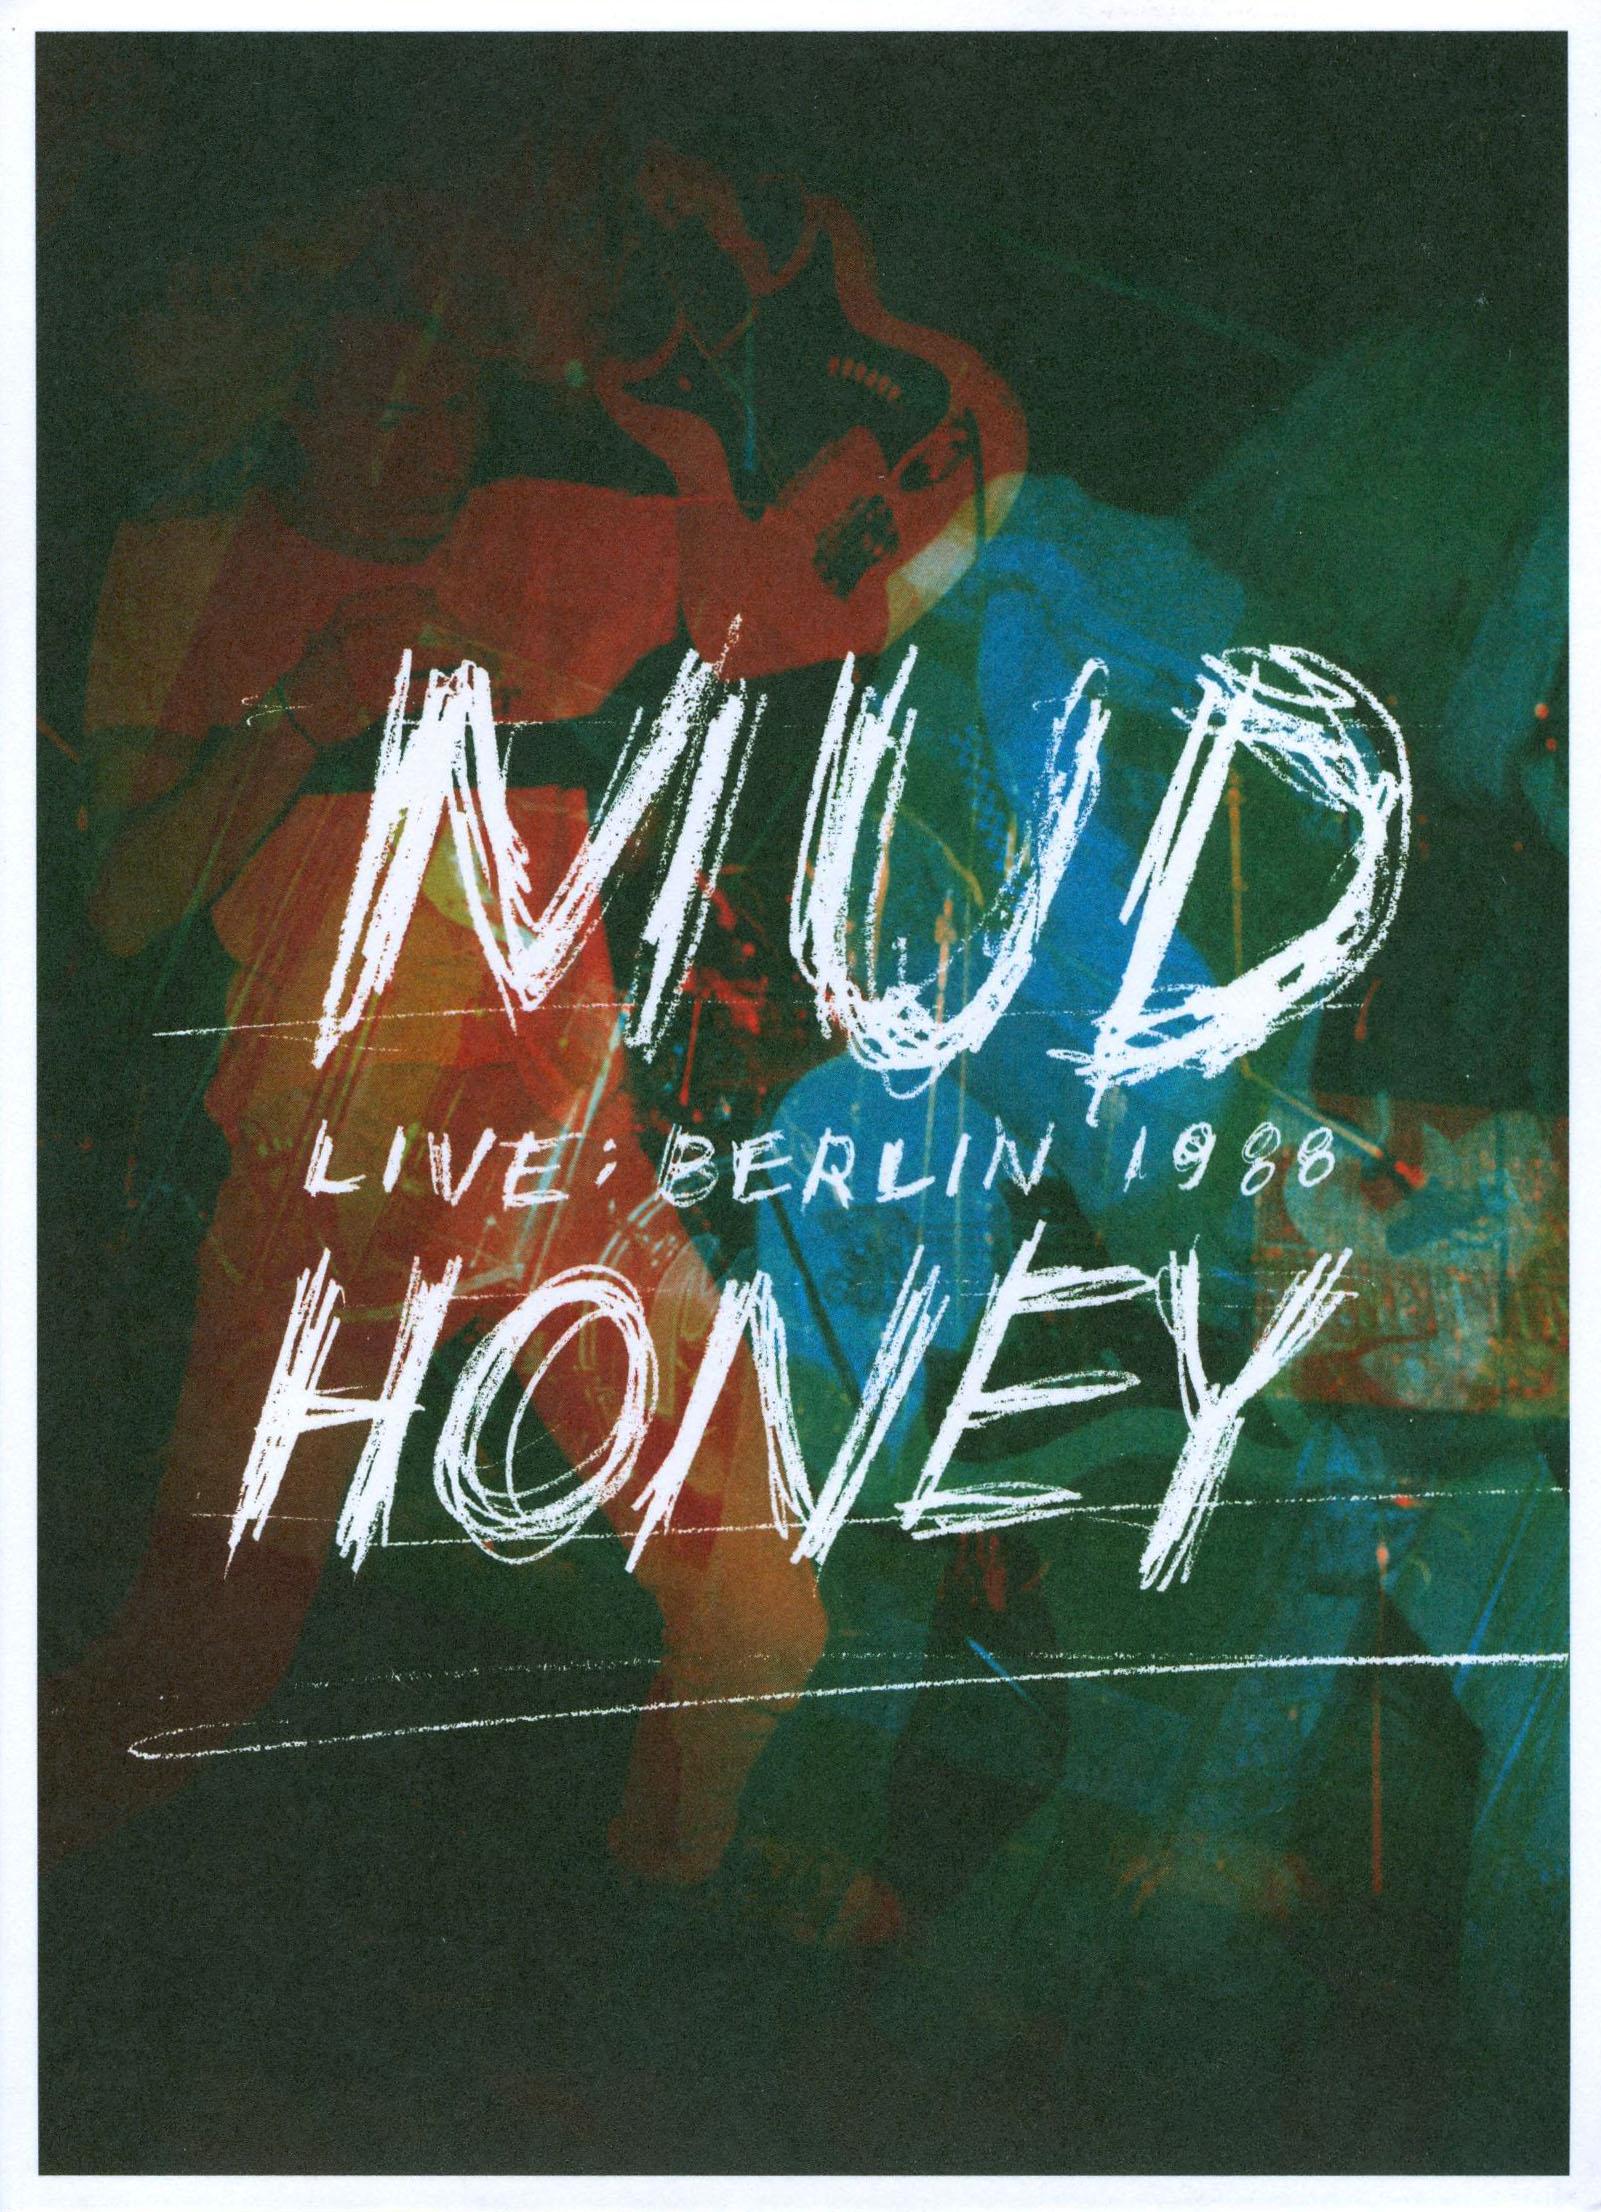 Mudhoney: Live - Berlin 1988